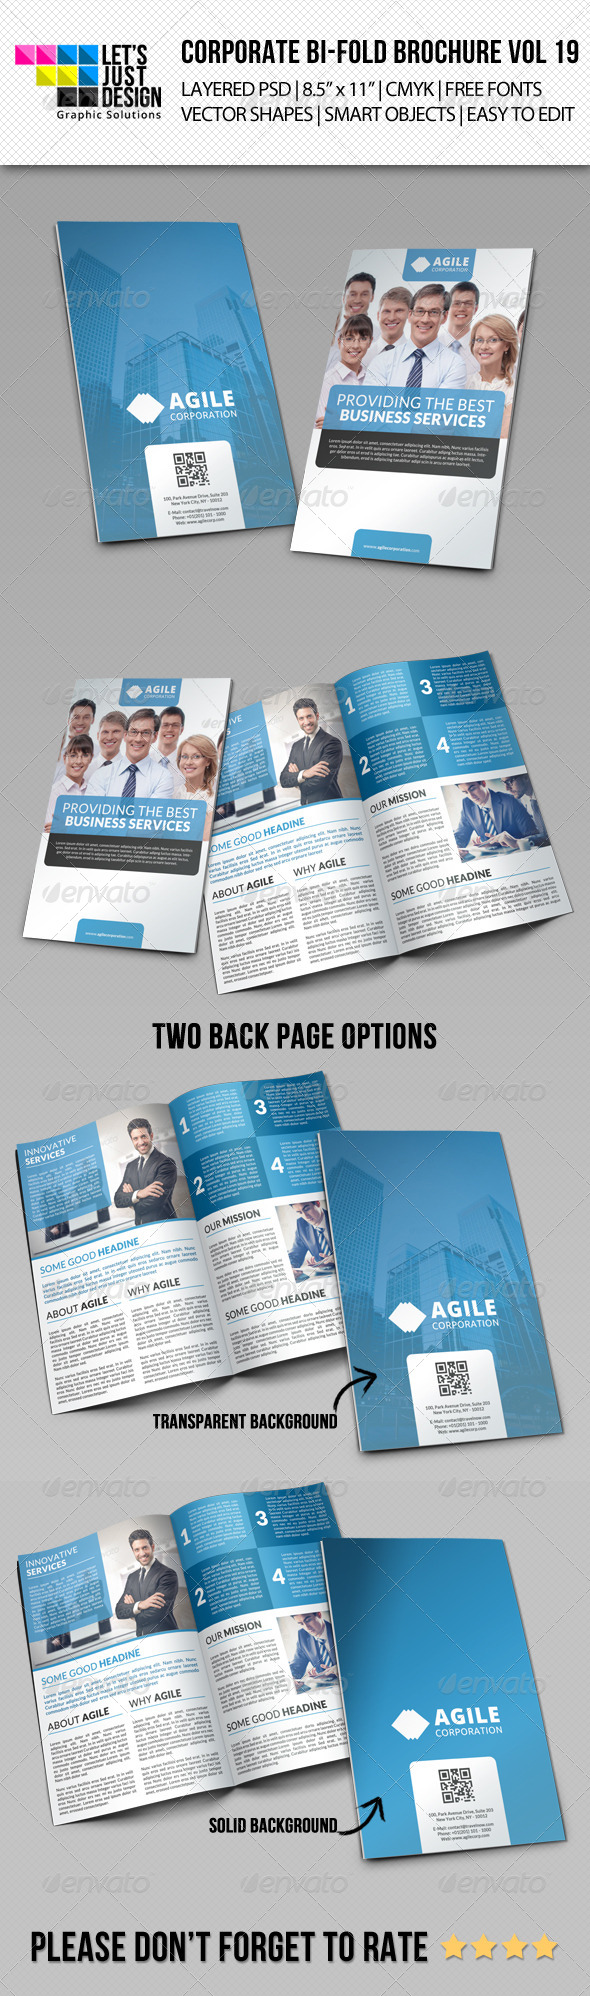 Corporate Bi-Fold Brochure Vol 19